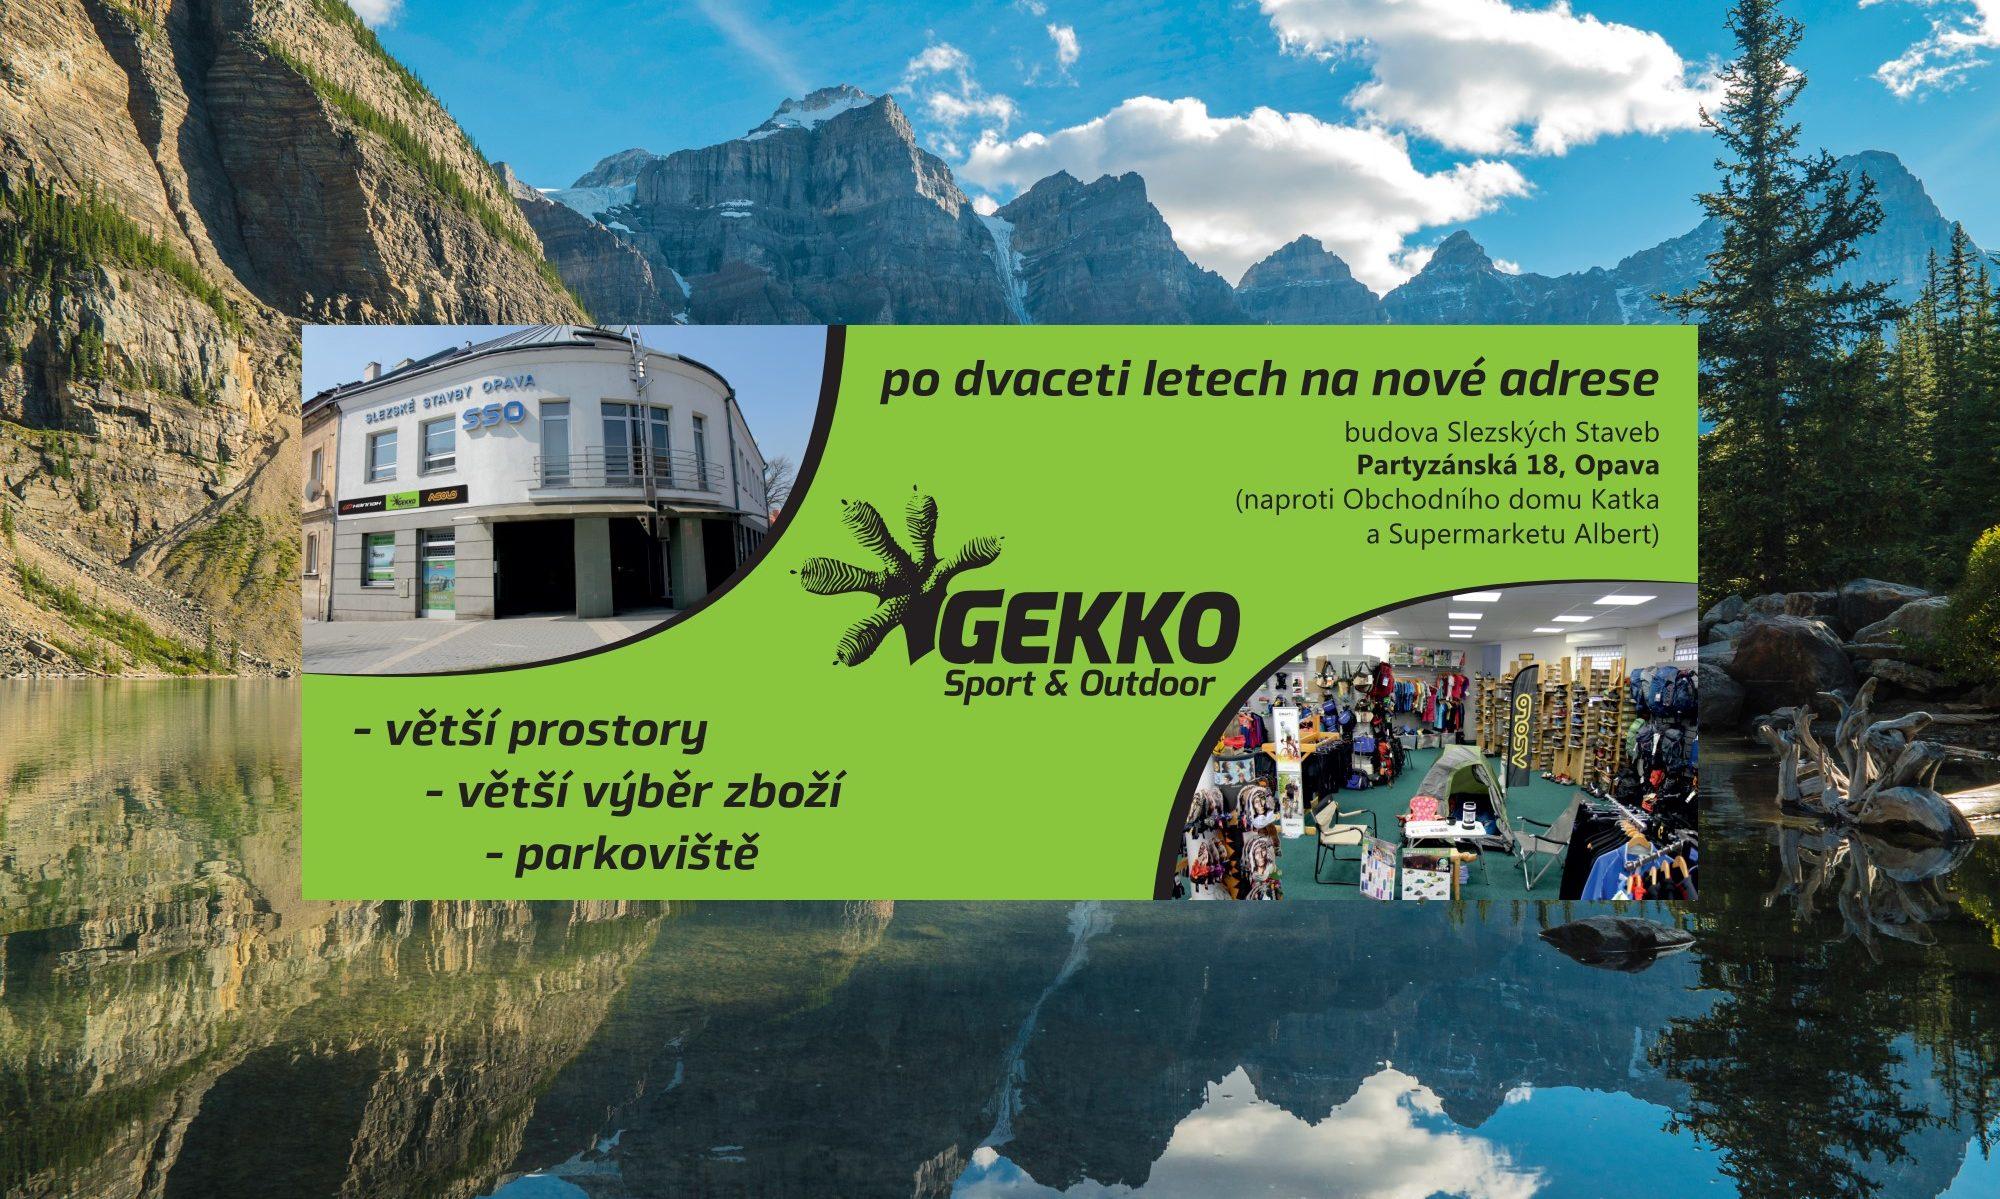 gekkosport.cz